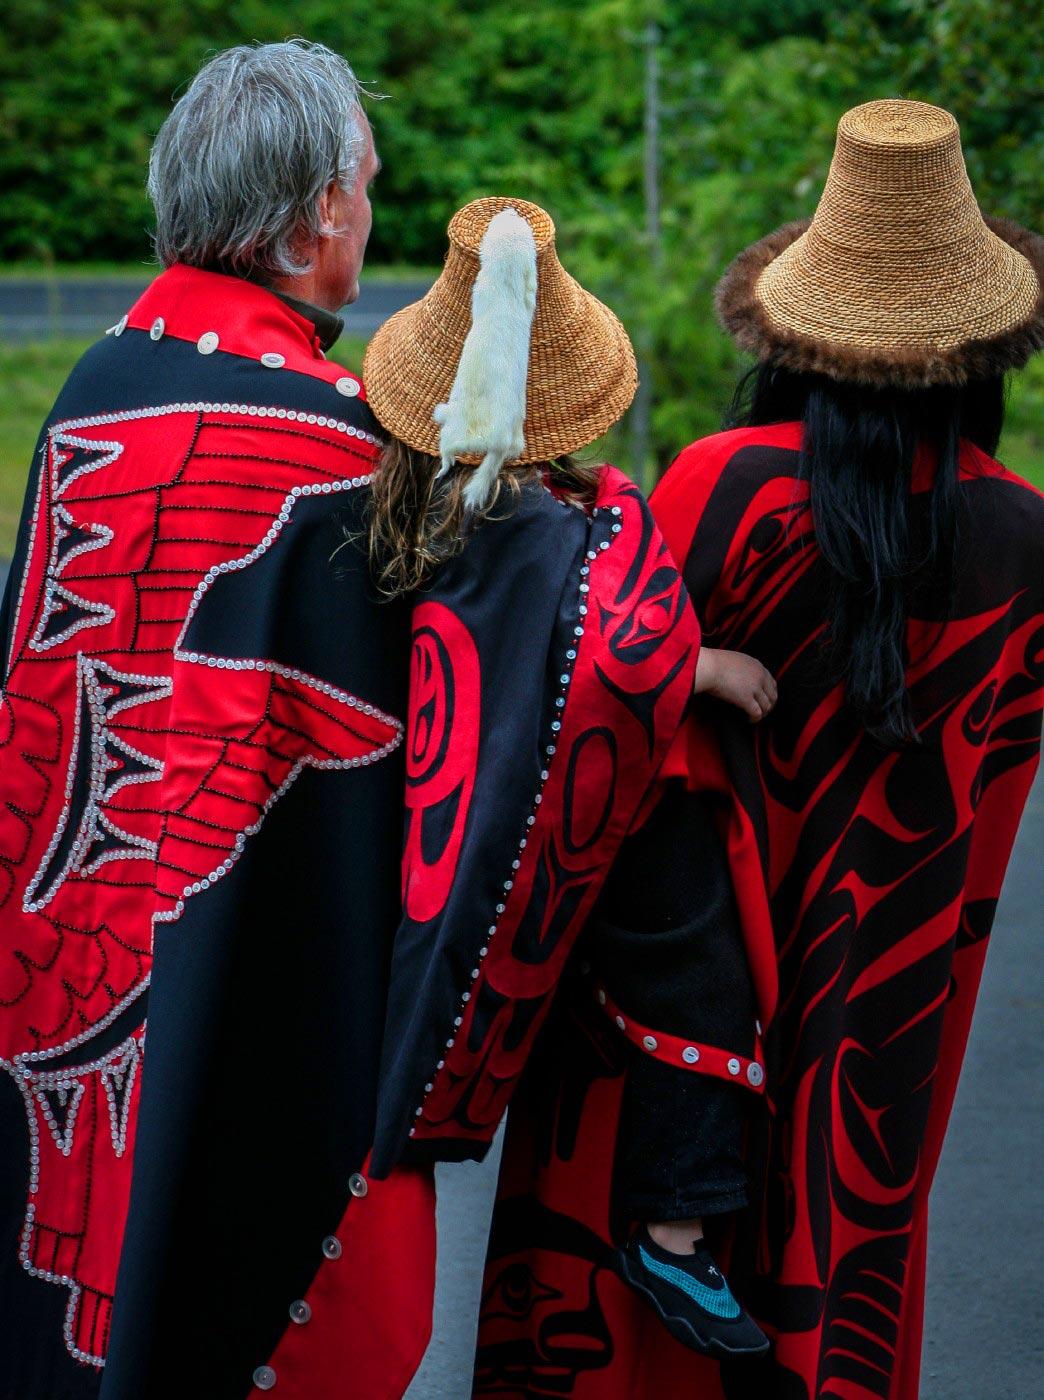 Haida Gwaii button blanket regalia